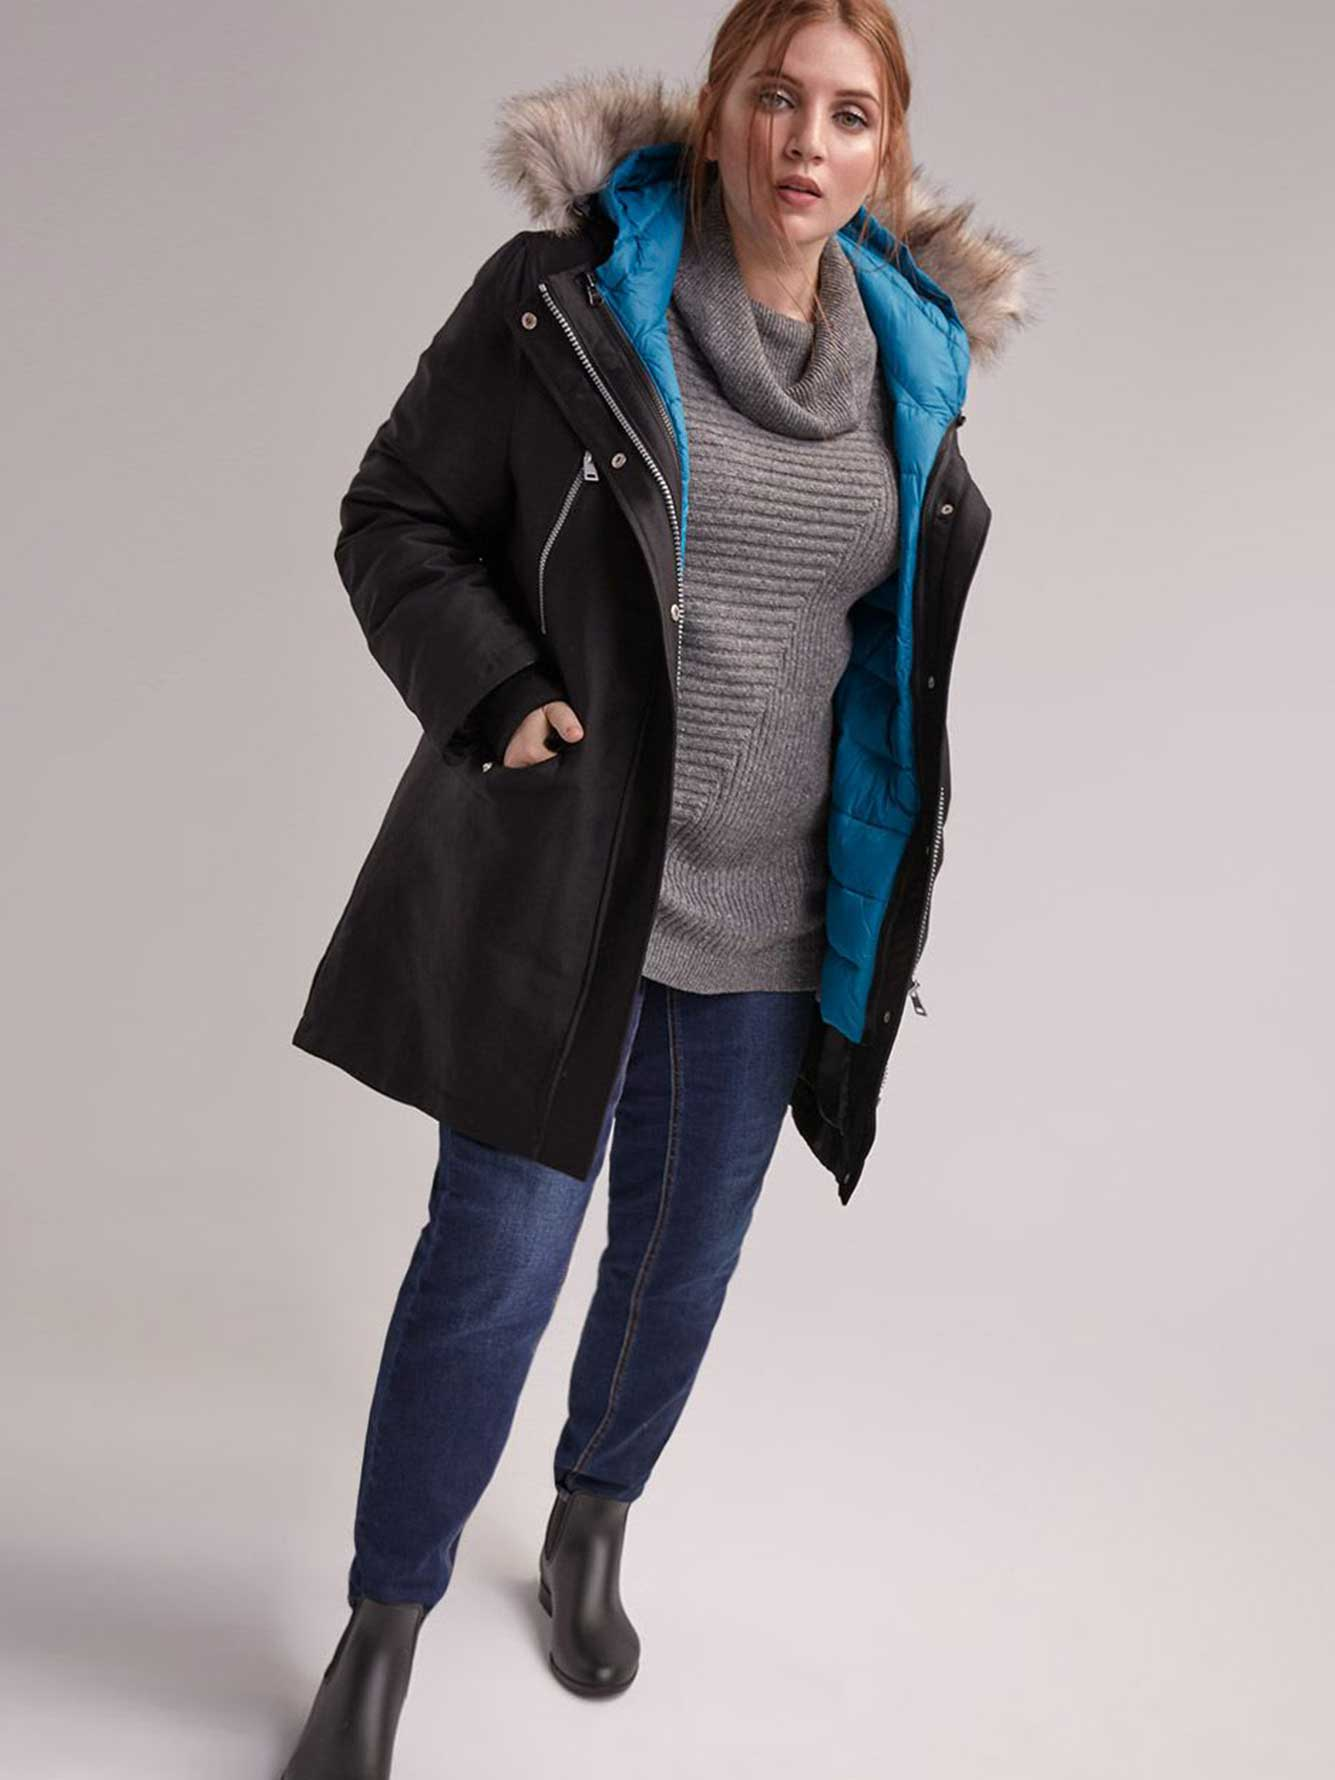 c0eac001e 3-1 Fur Hooded Parka with Concealed Packable Jacket - Livik